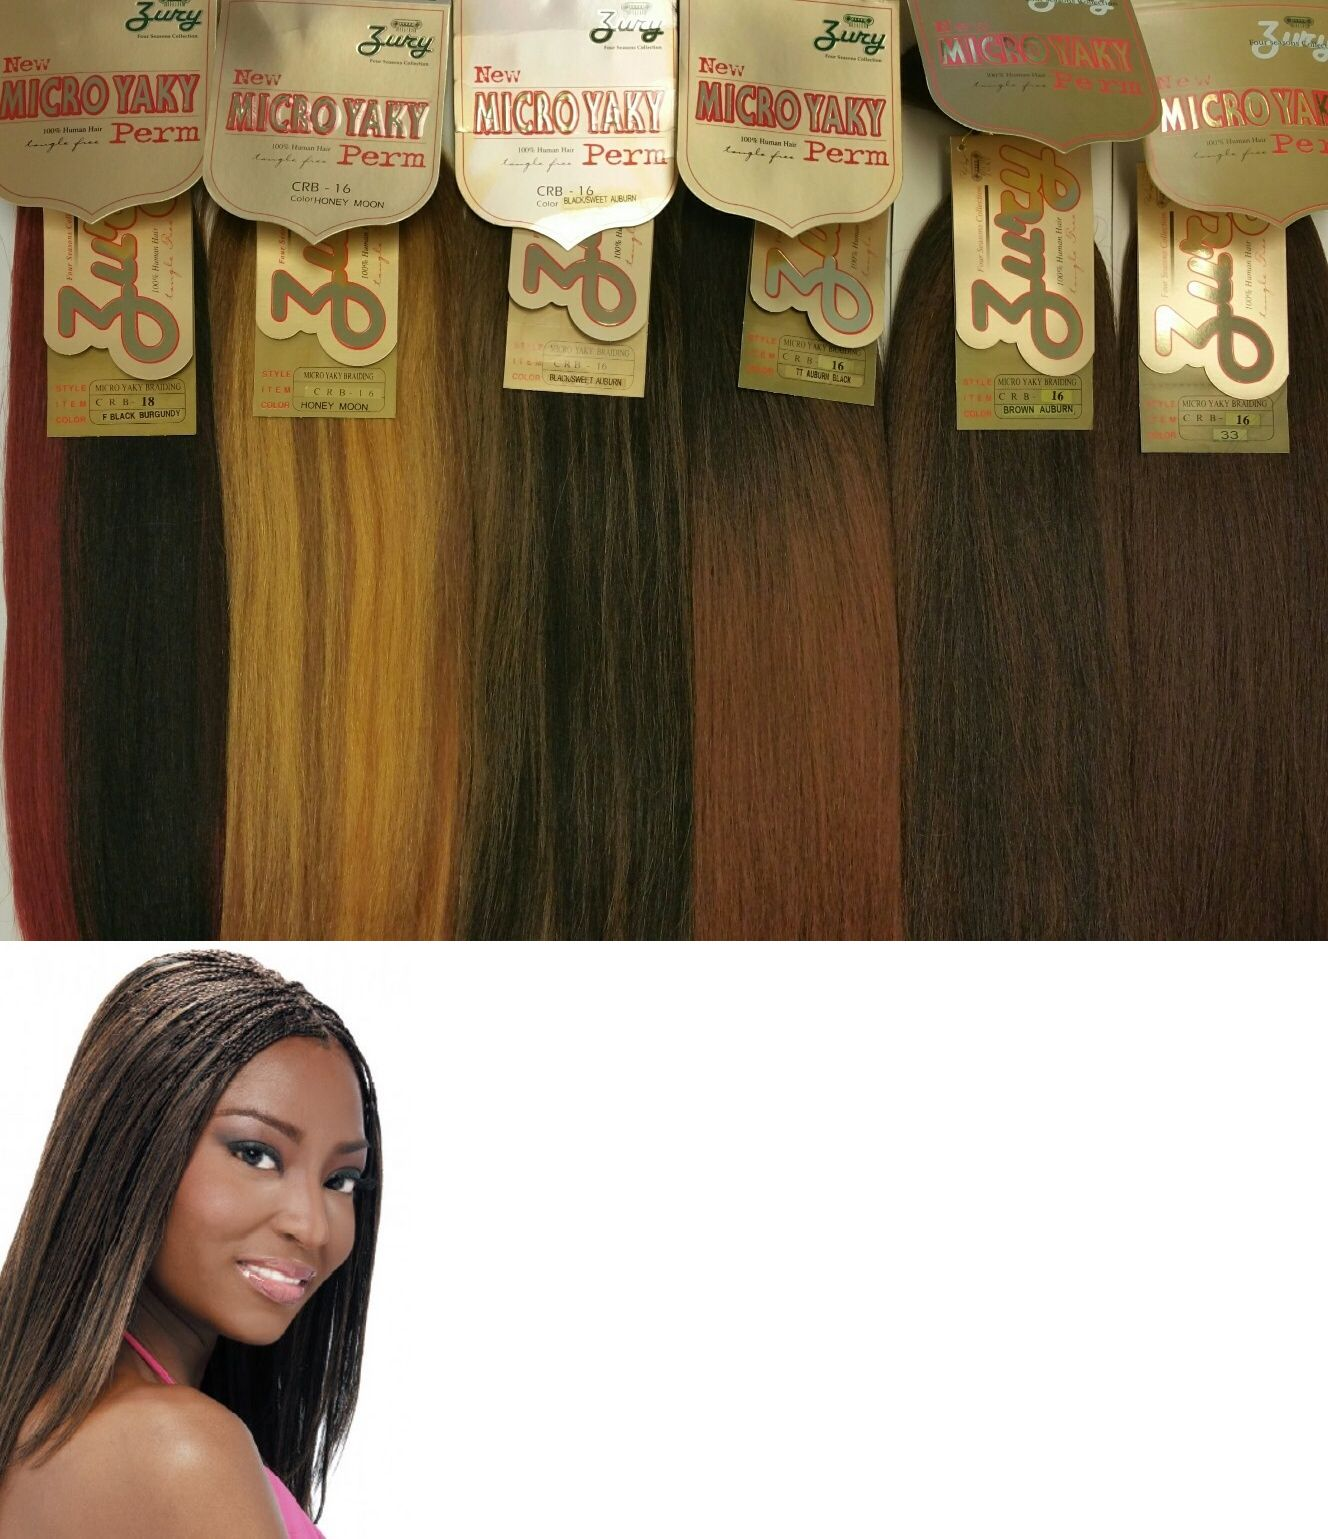 Hair extensions zury human hair for braiding micro yaky perm